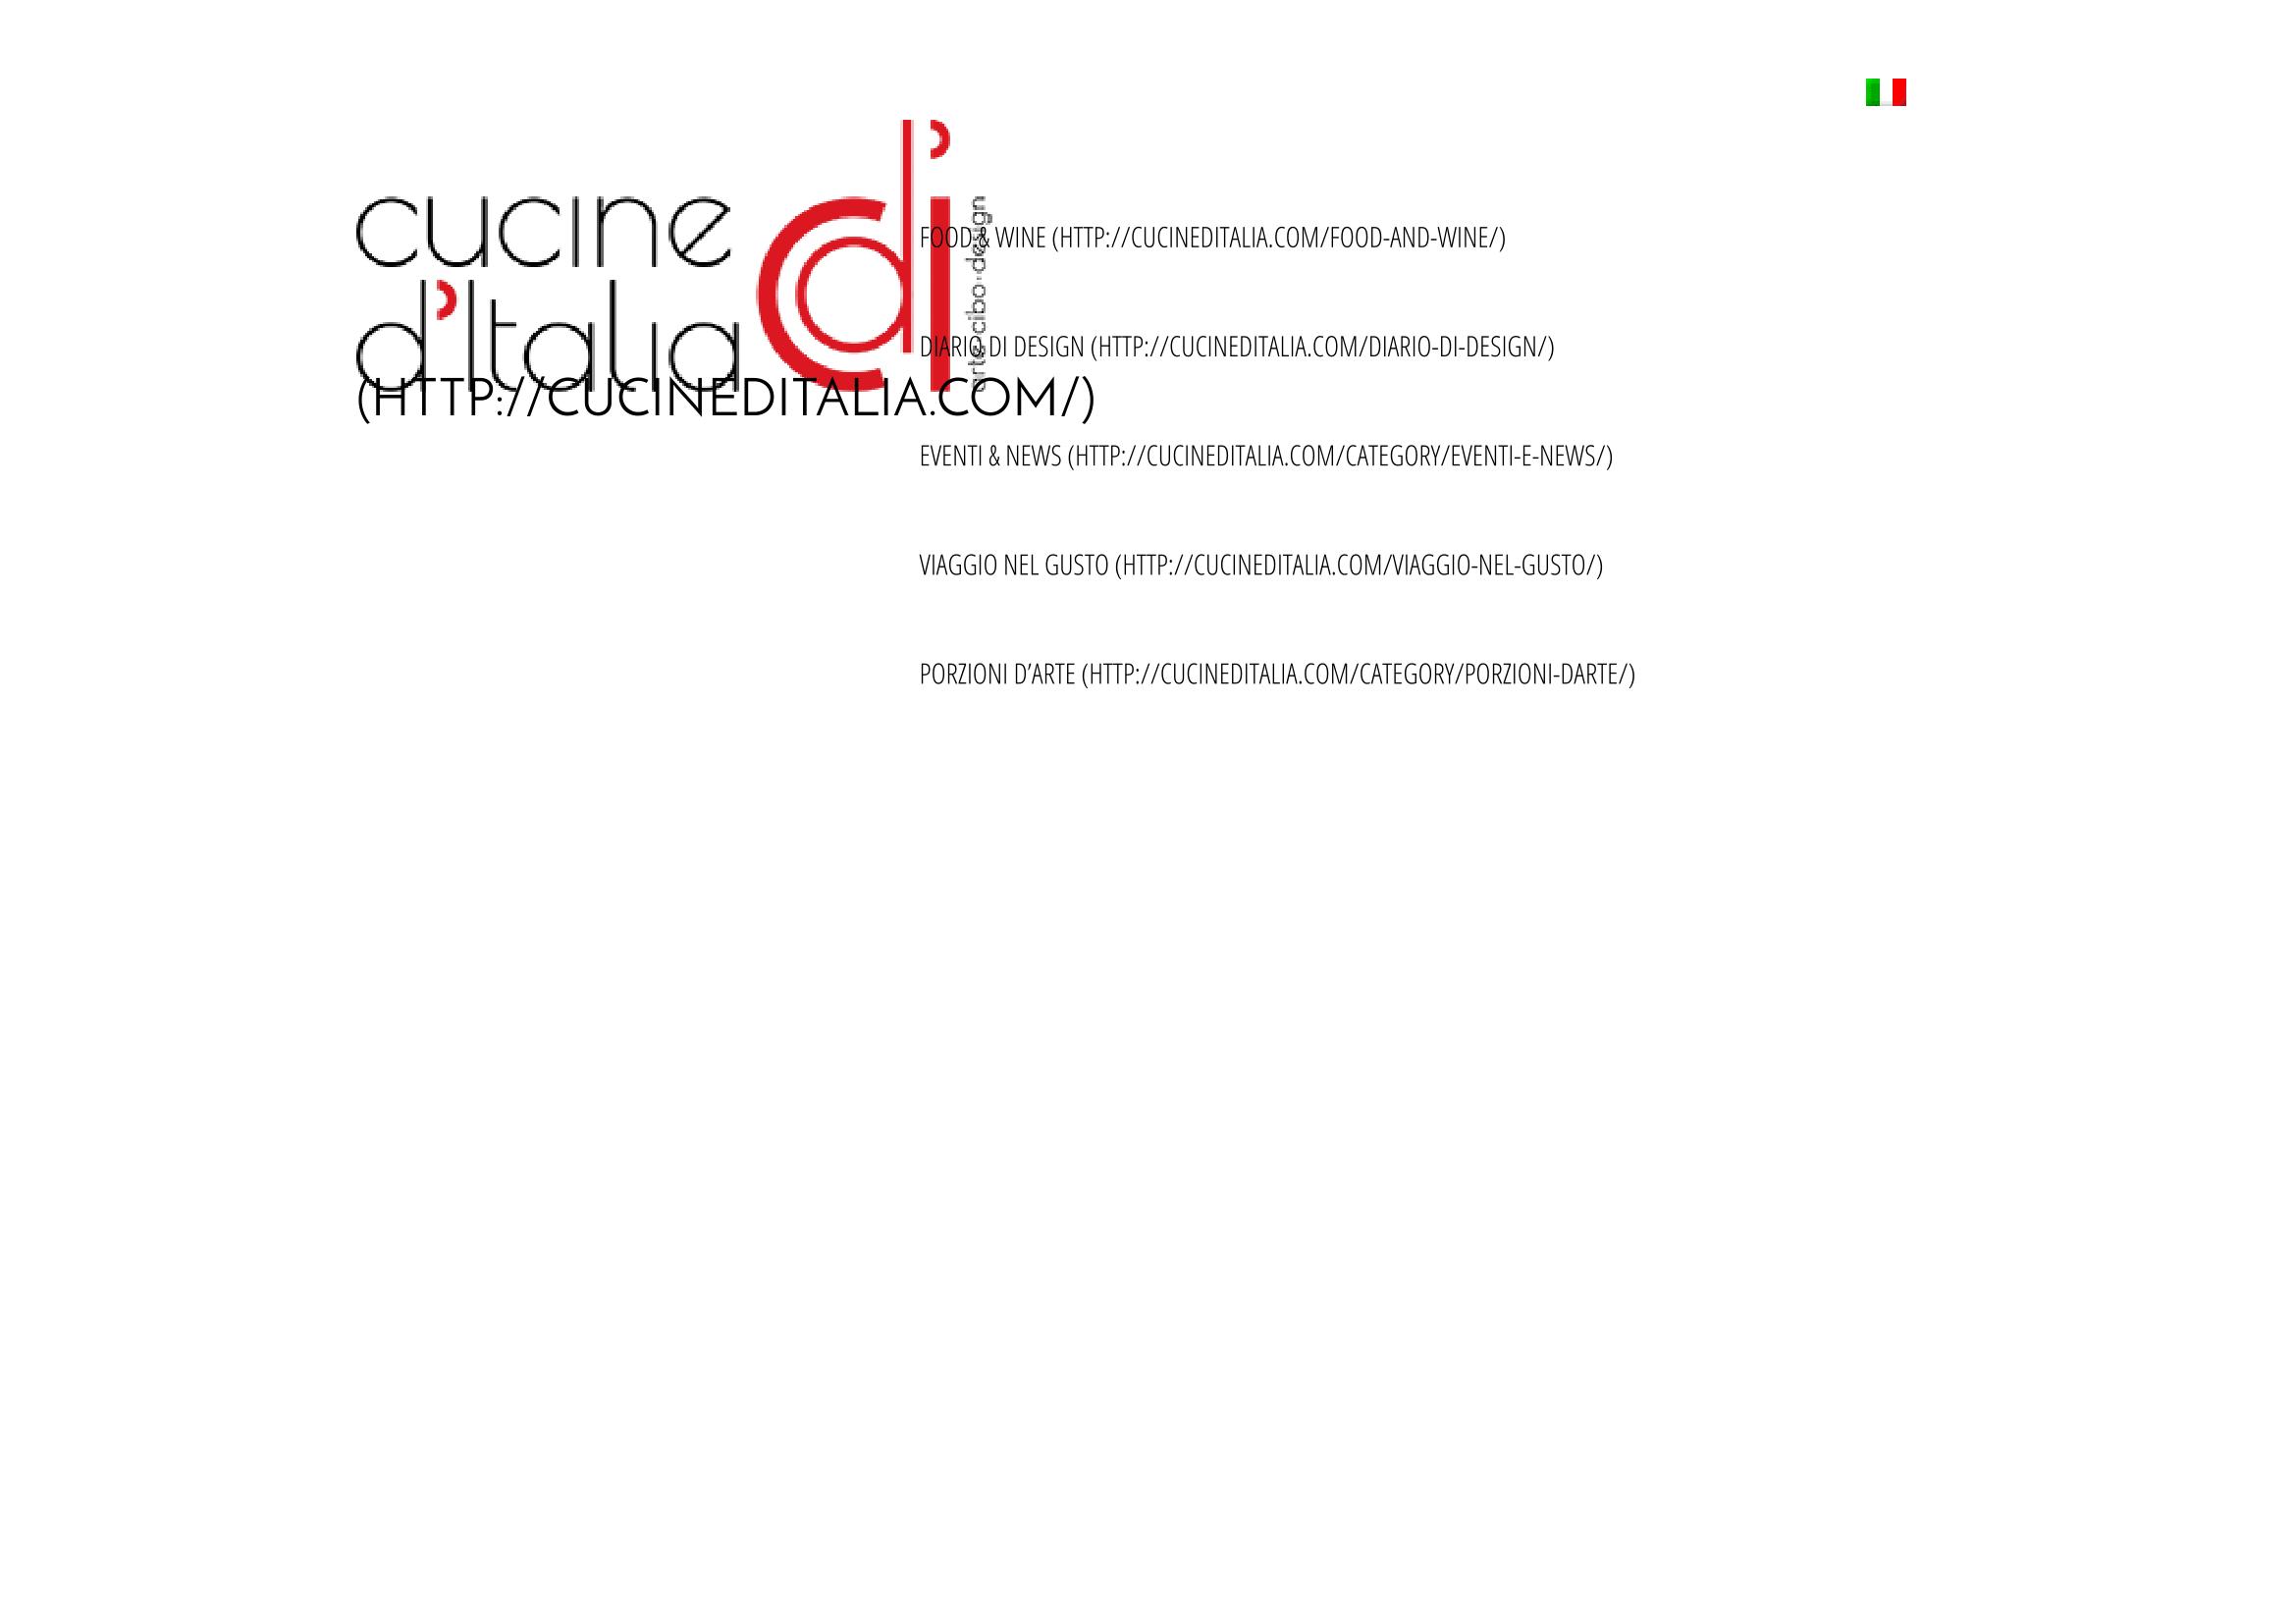 20.05.2016_cucineditalia.com-1